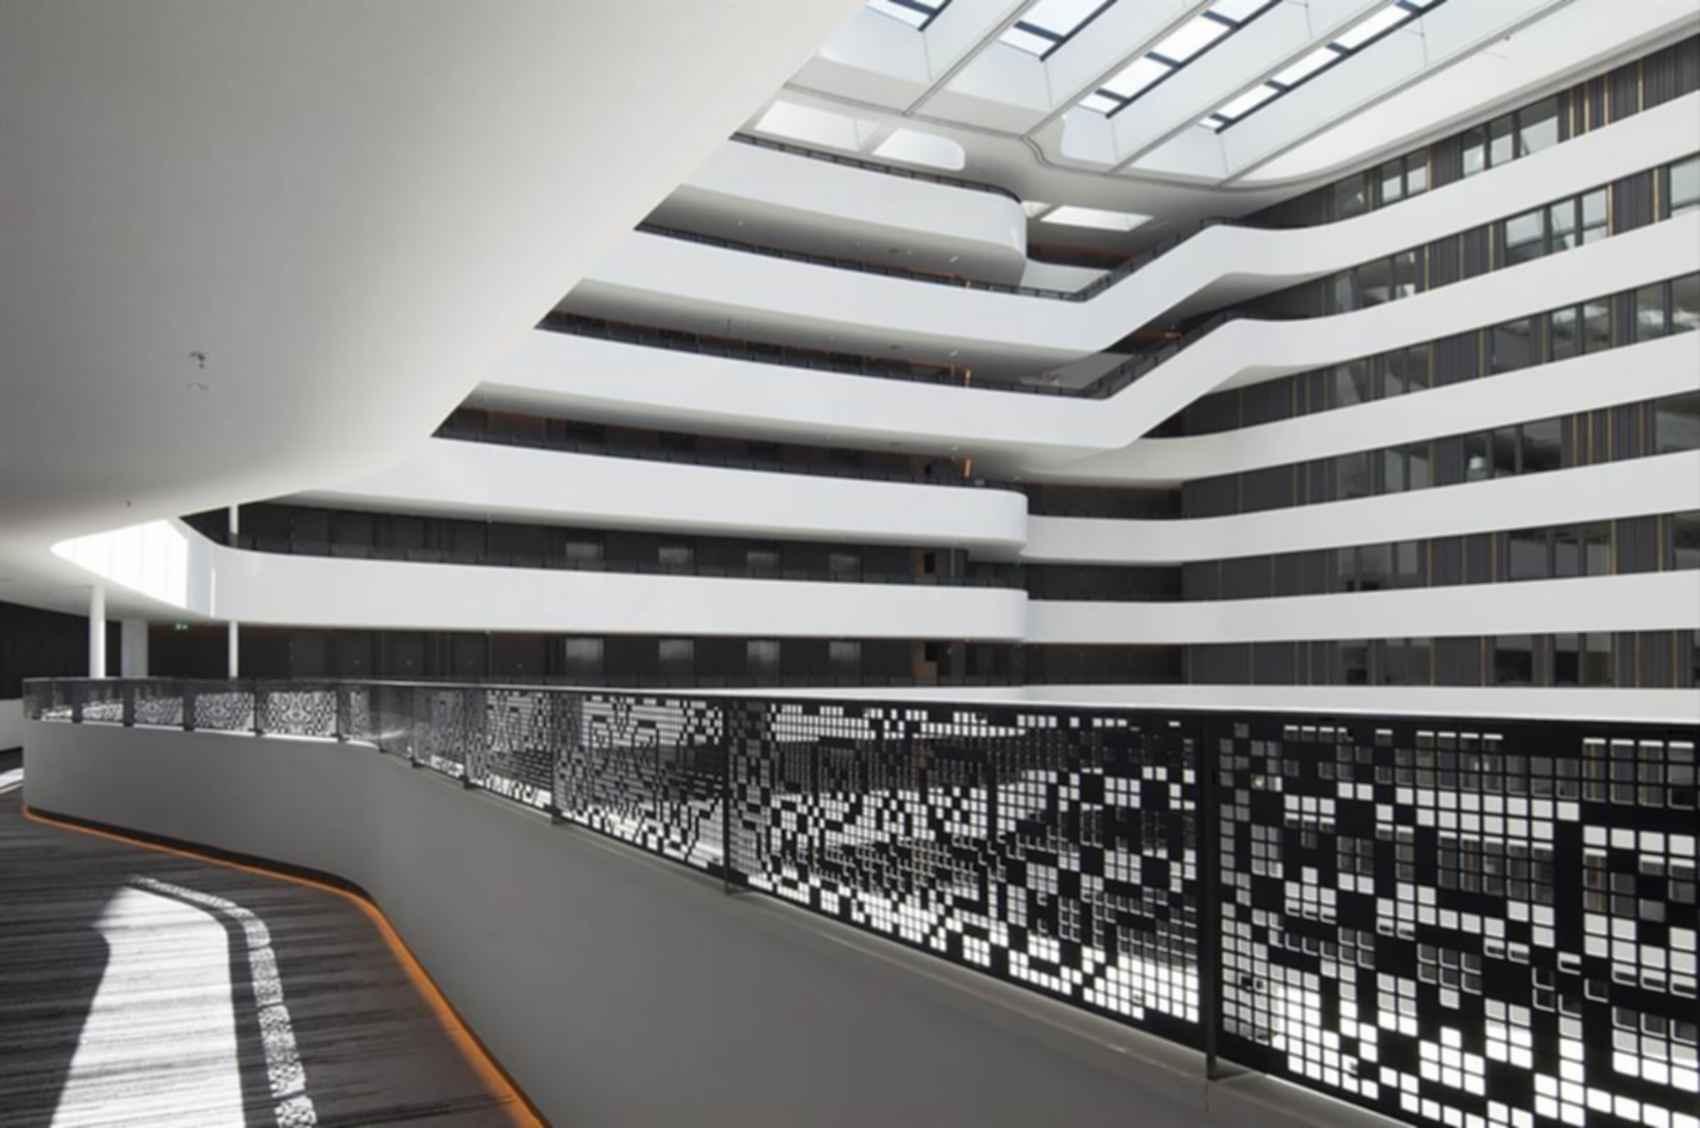 Hilton Amsterdam Airport Schiphol - Interior